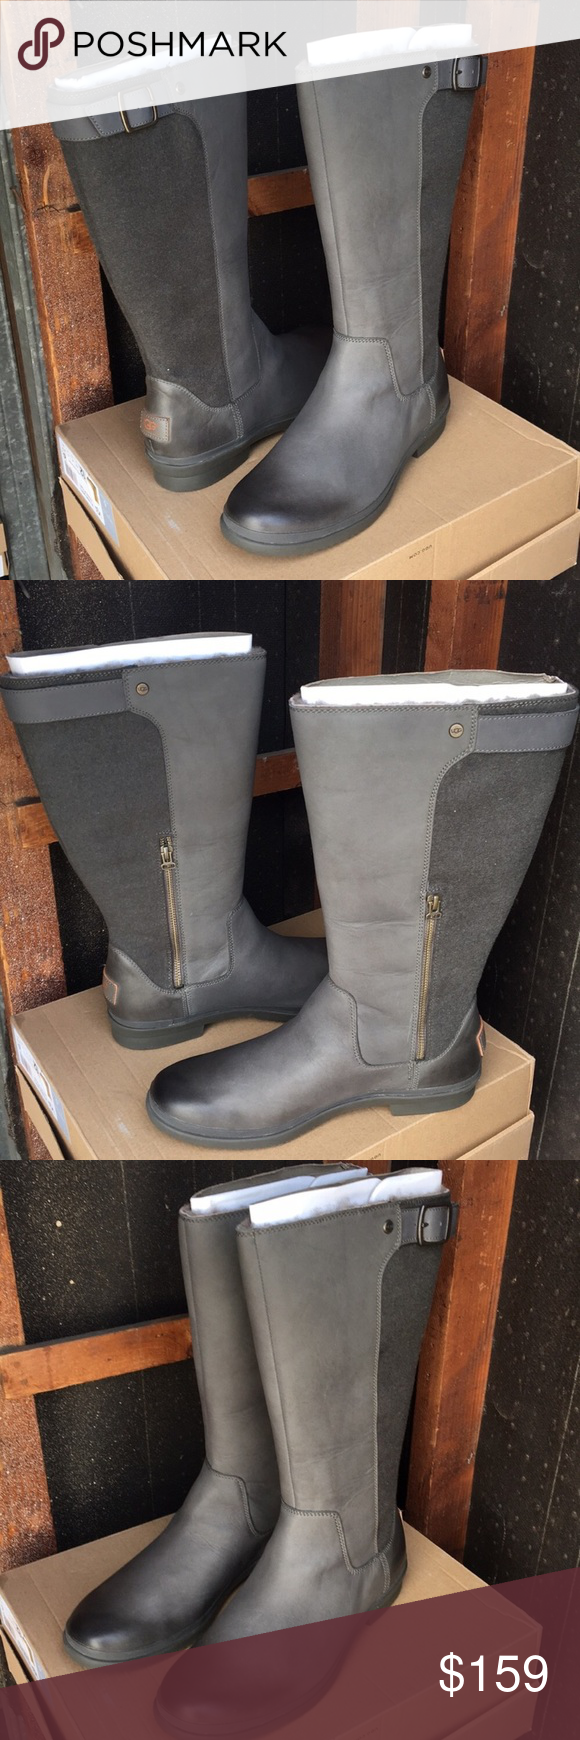 6610e2e17ba ❤️New Ugg Janina Slate Gray color tall boots sz 11 ❤️New Ugg ...